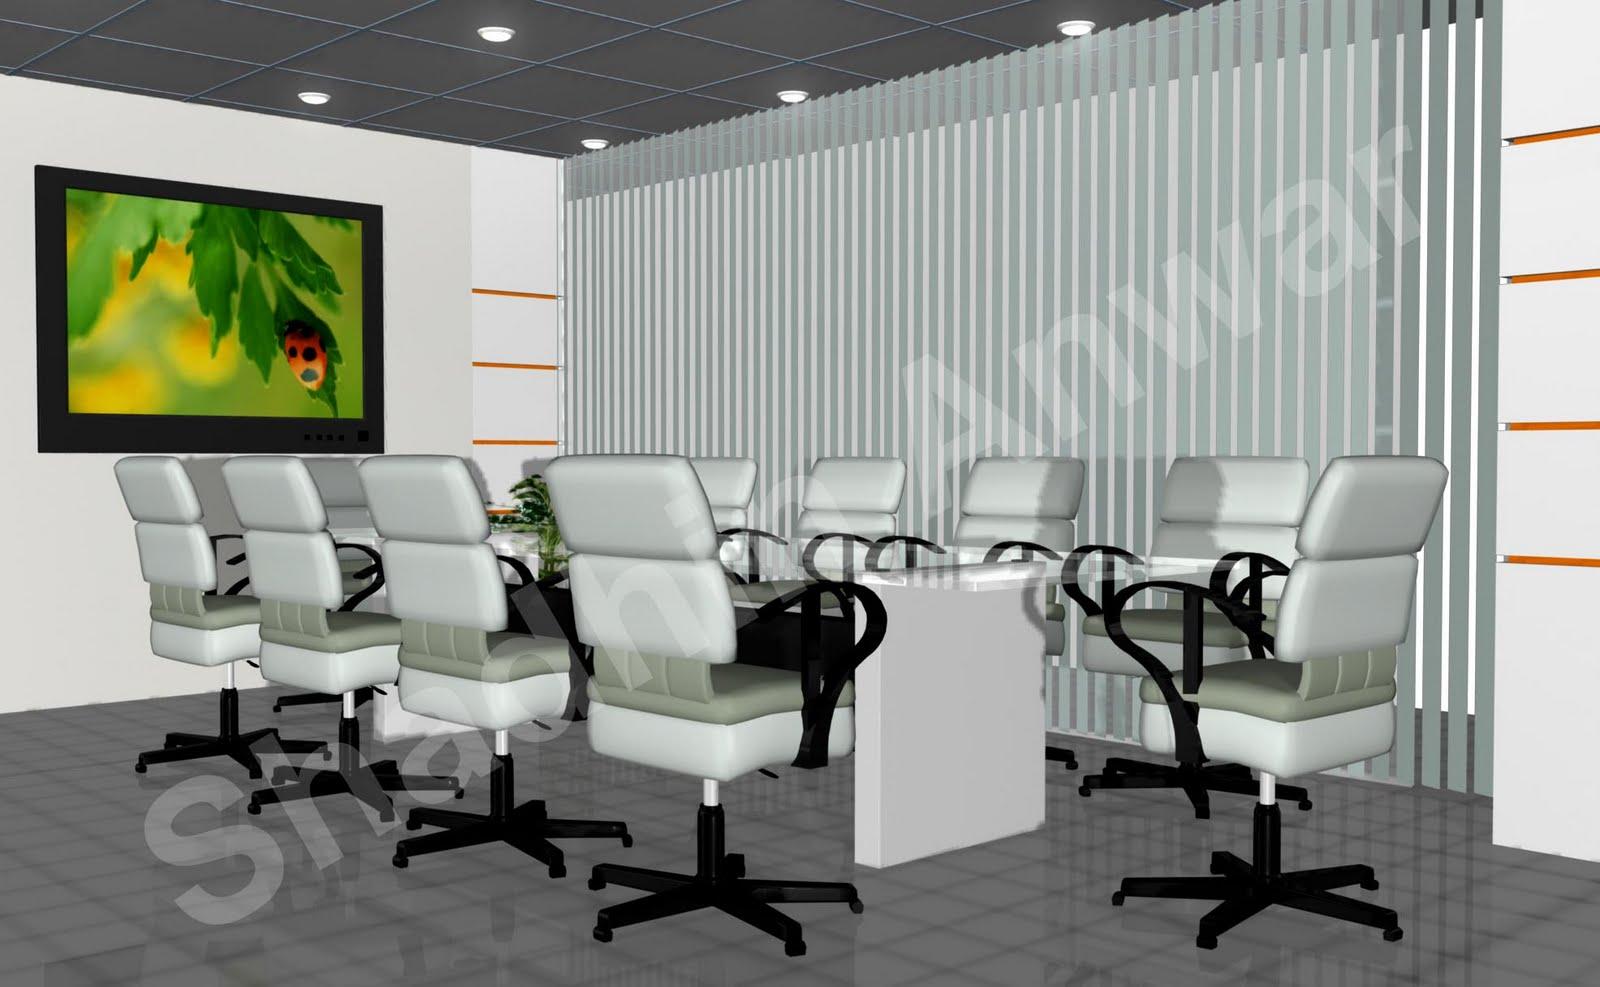 Shadhin 39 S Personal Blog 3d Views Of Office Interior Design